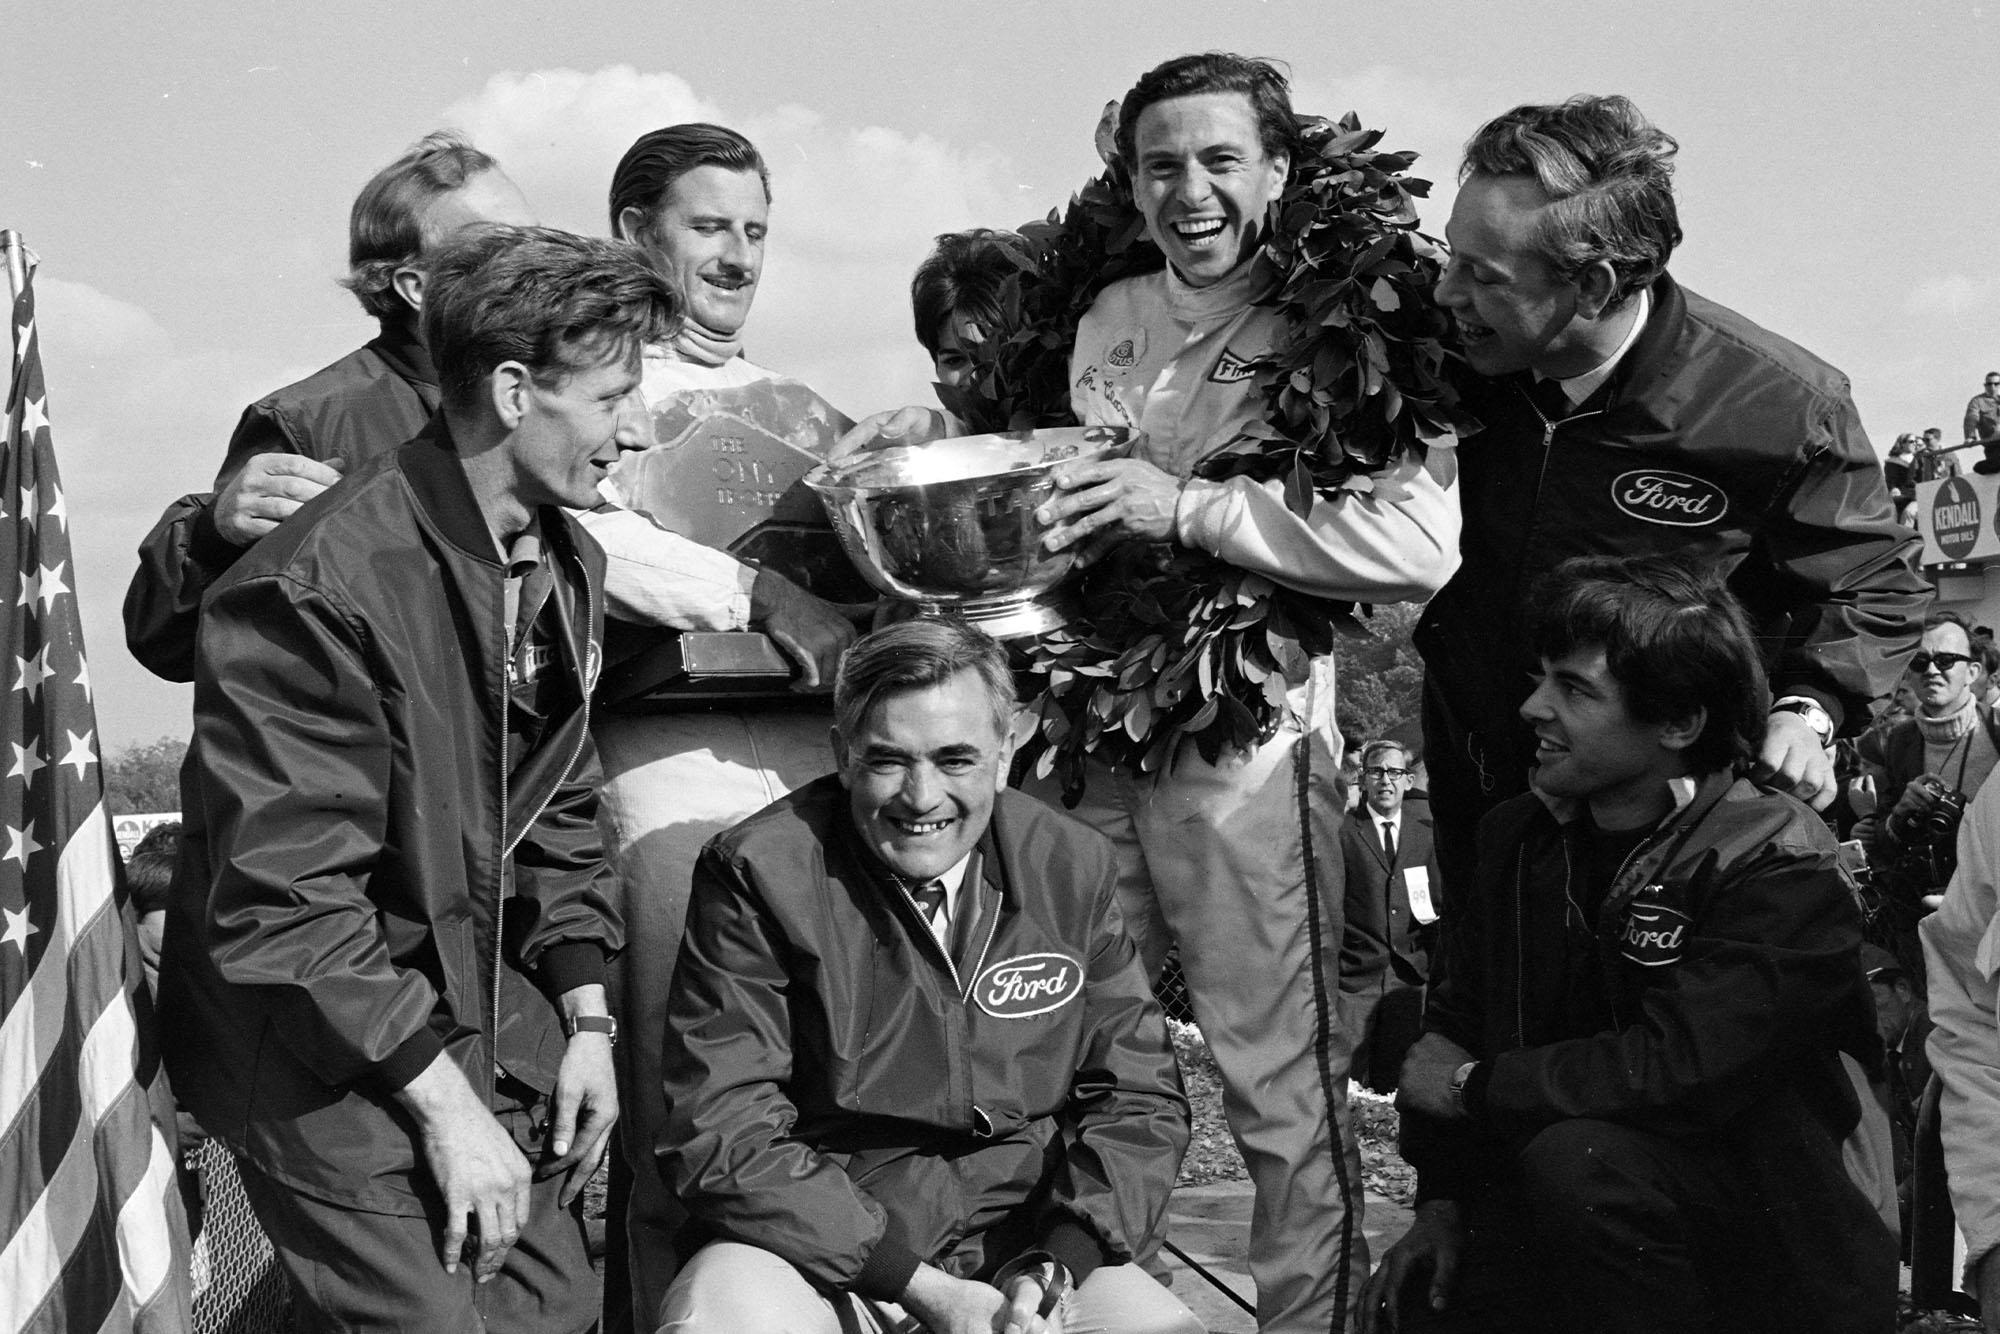 The Lotus team celebrate on the podium